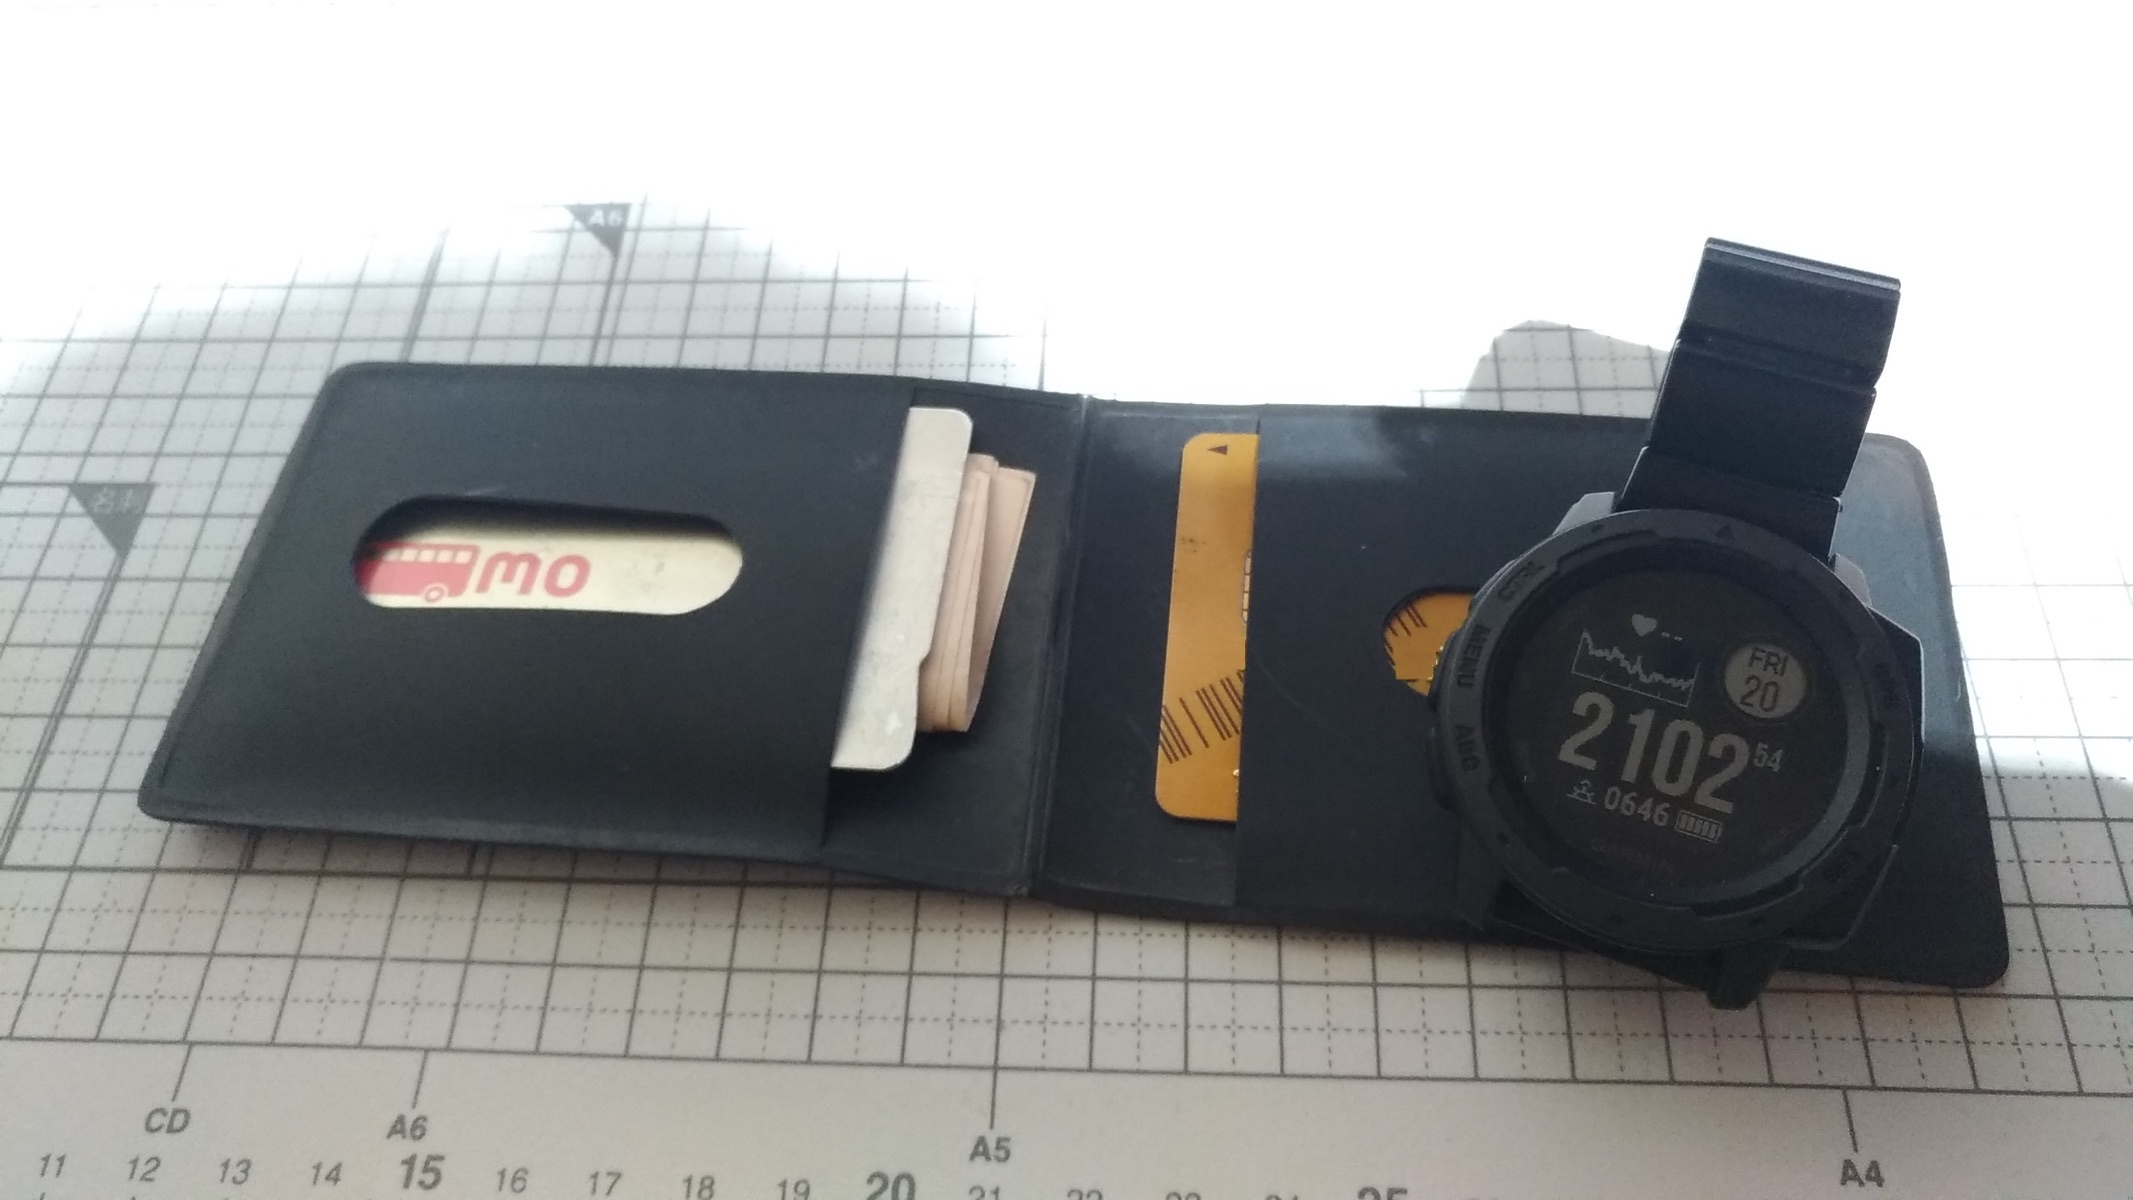 Garmin InstindtとSONY wena wrist proとPASMOとクレジットカード_[0]